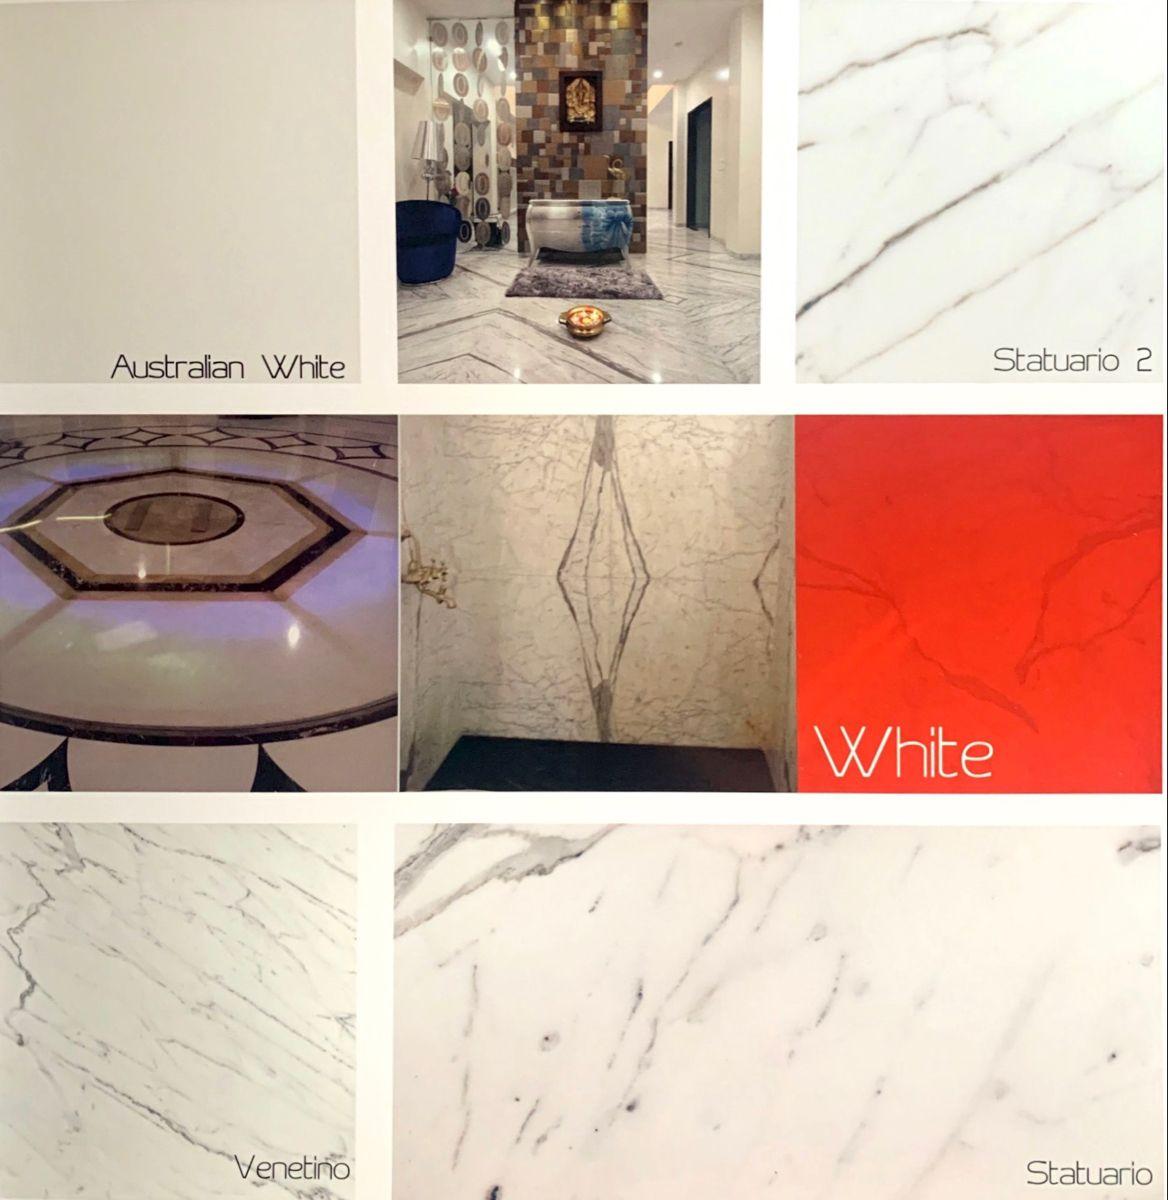 Statuario Marble White Marble Price In Hyderabad In 2020 Marble Price Italian Marble Flooring Italian Marble